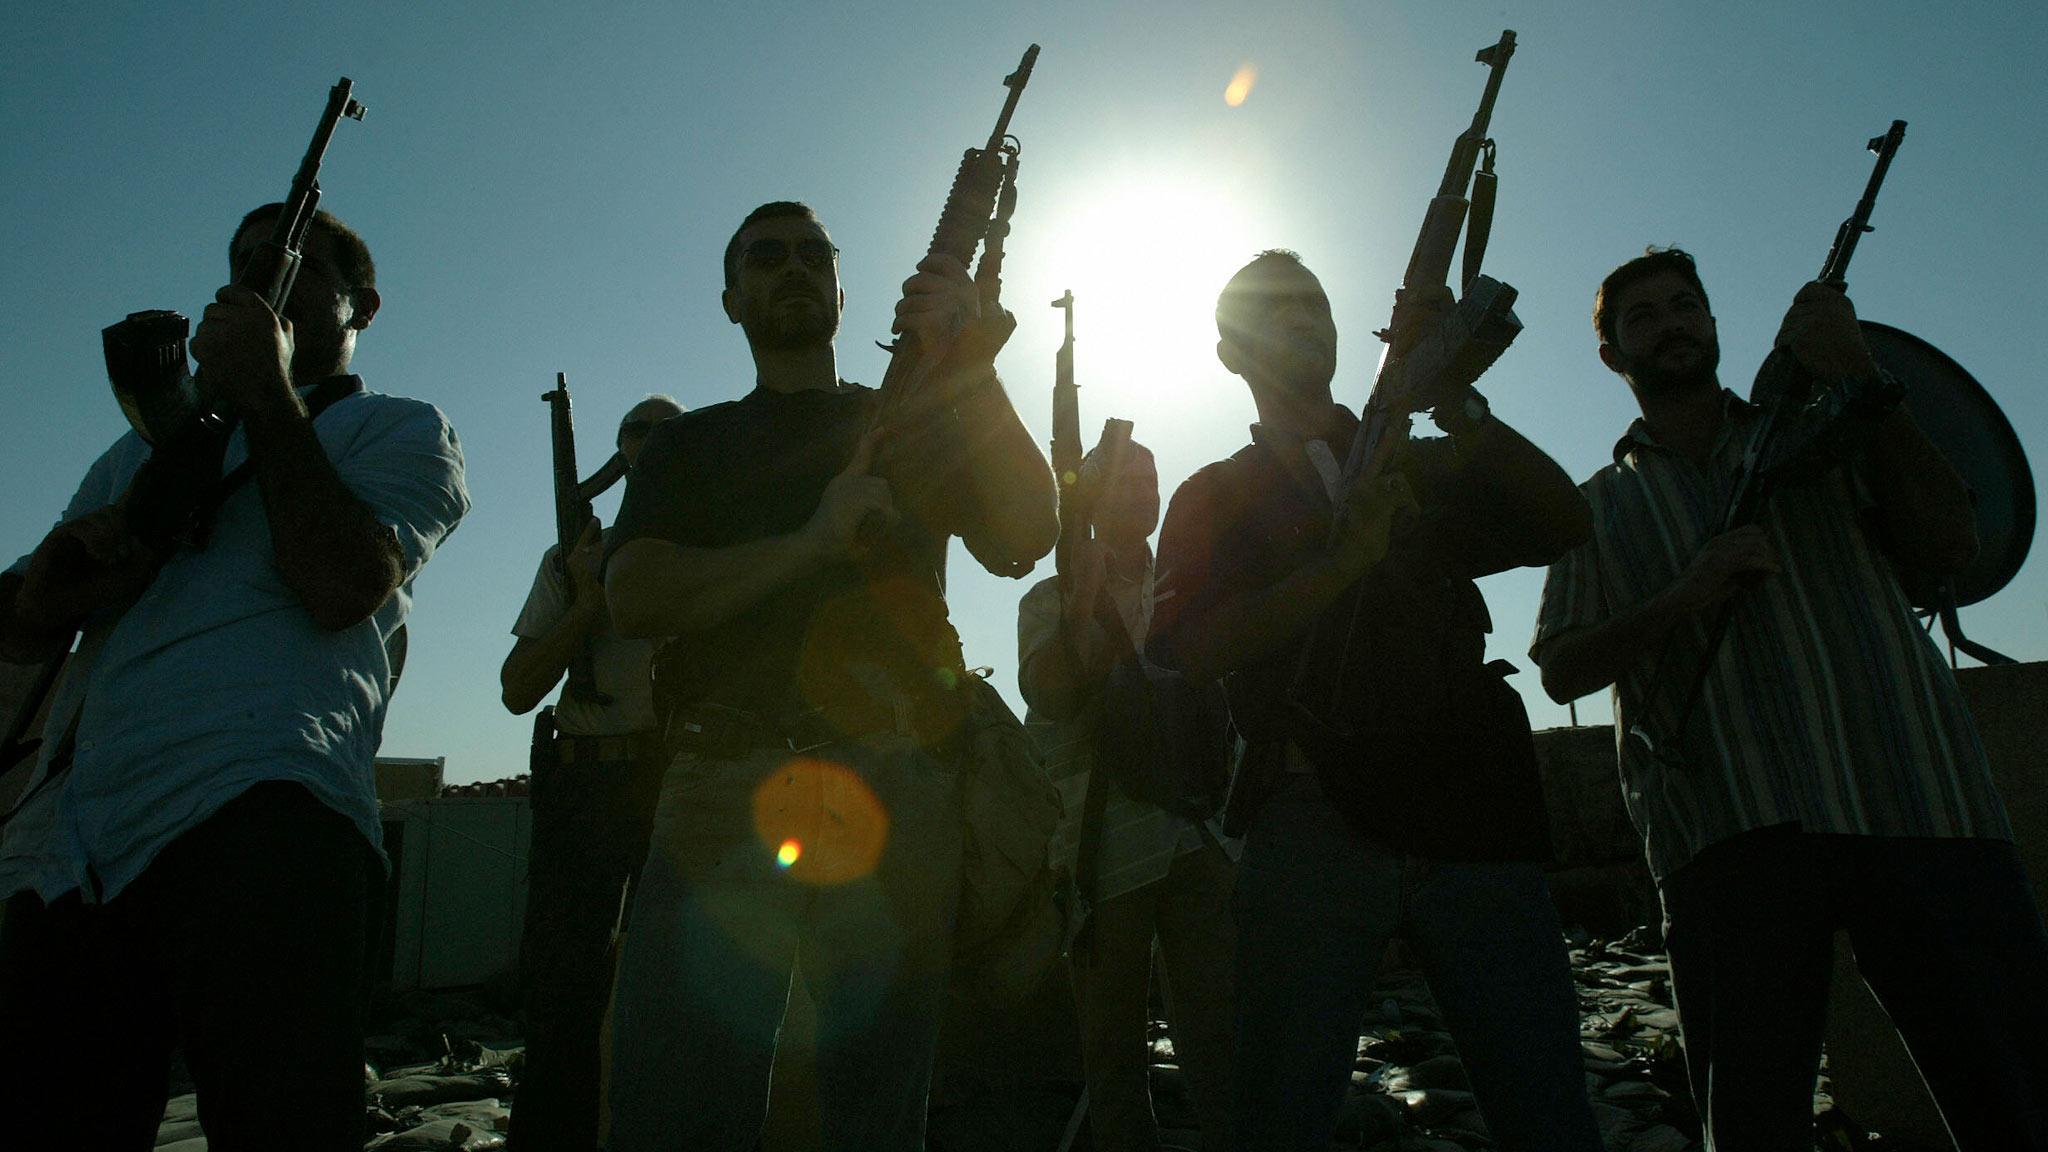 Contractors reap $138bn from Iraq war   Financial Times